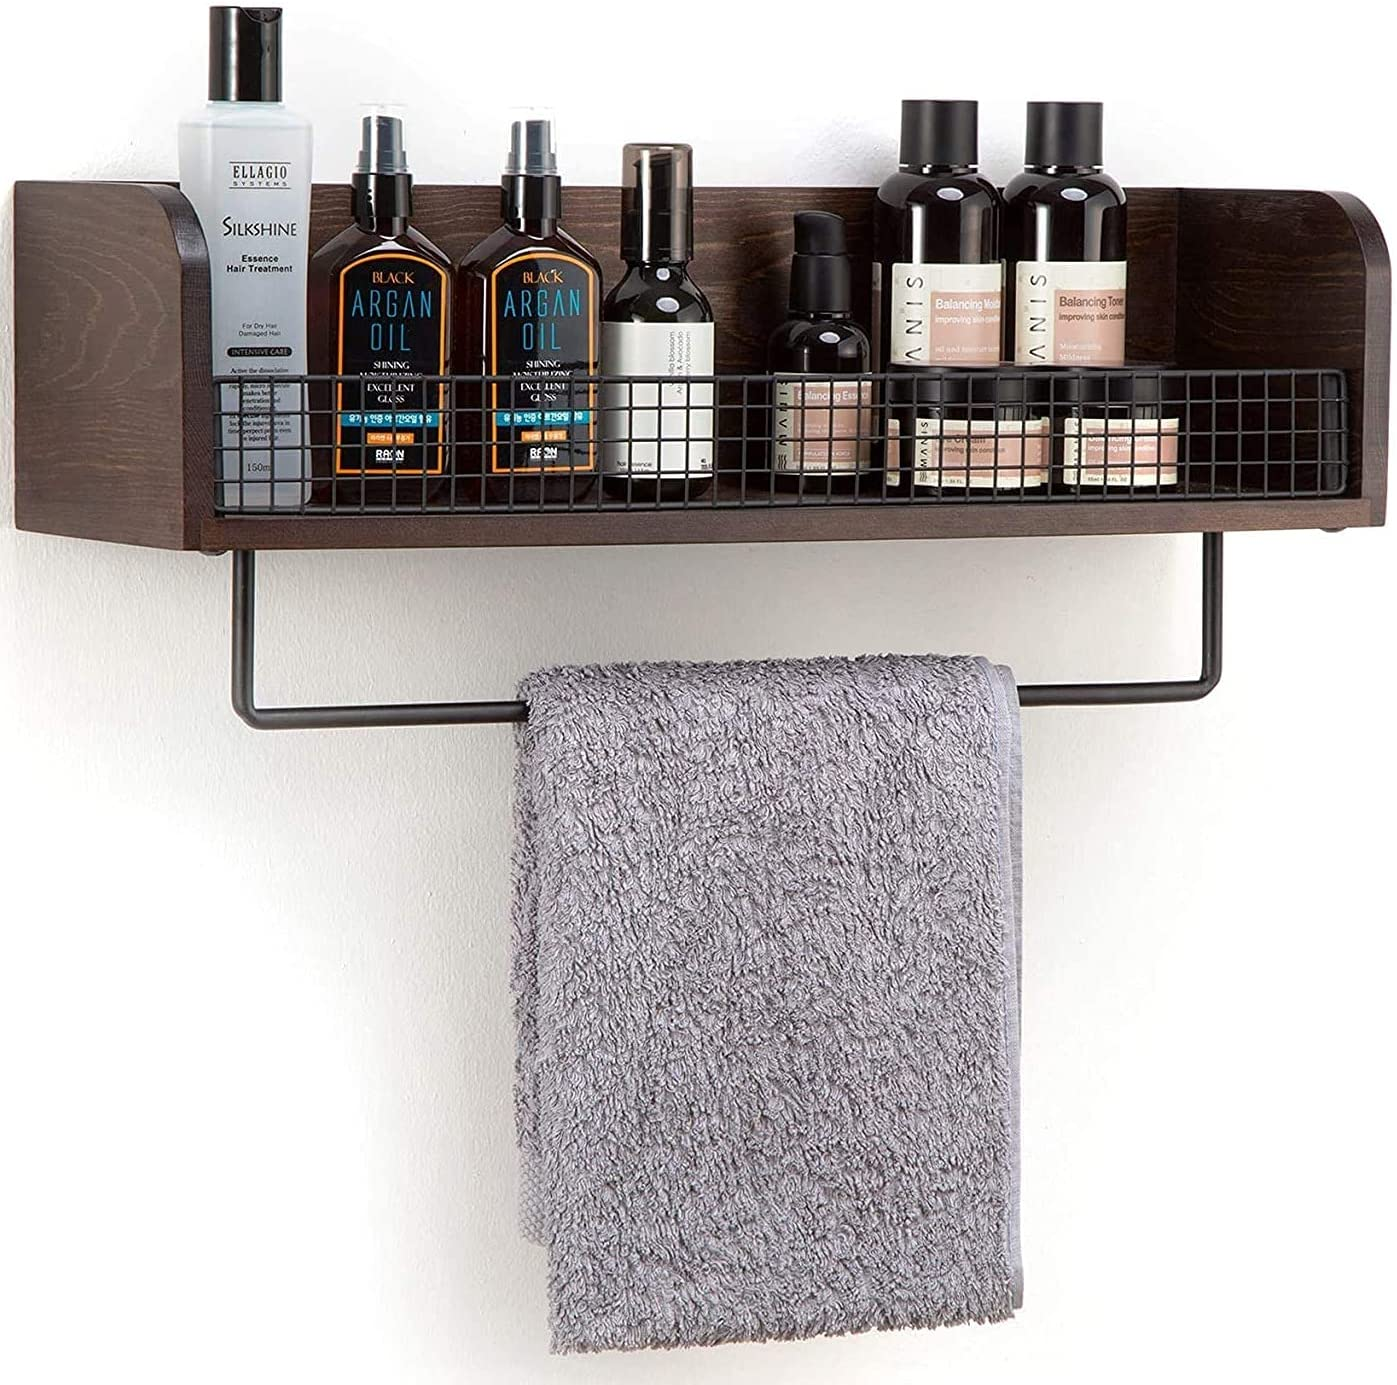 Free shipping on posting reviews J JACKCUBE DESIGN Wall mount Rustic Bathroom Wood Black Reservation Metal